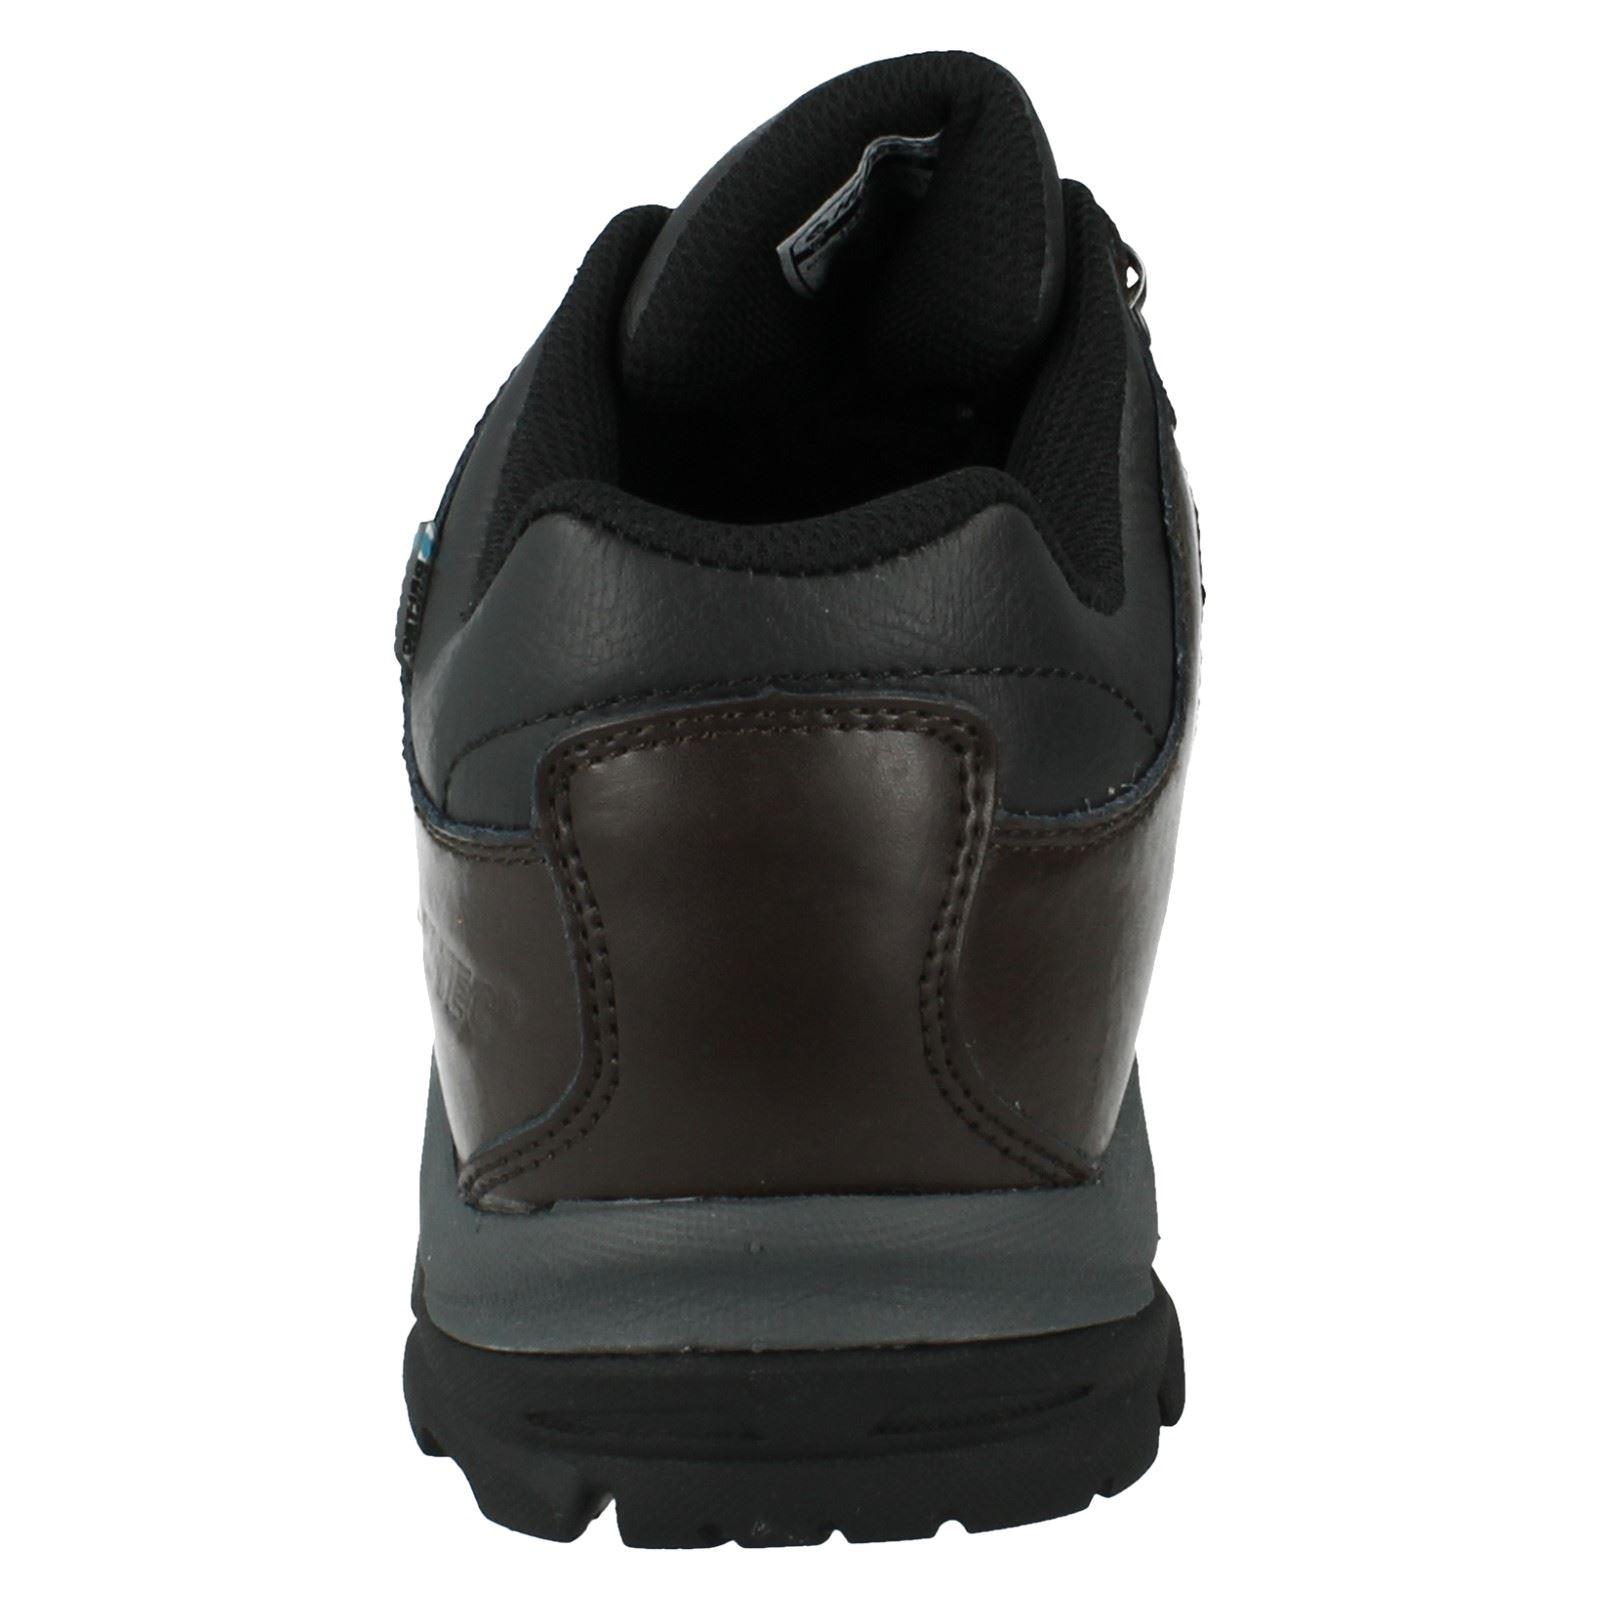 Mens Hi-Tec Casual Eurotrek Shoes The Style - Eurotrek Casual II Low 177a30